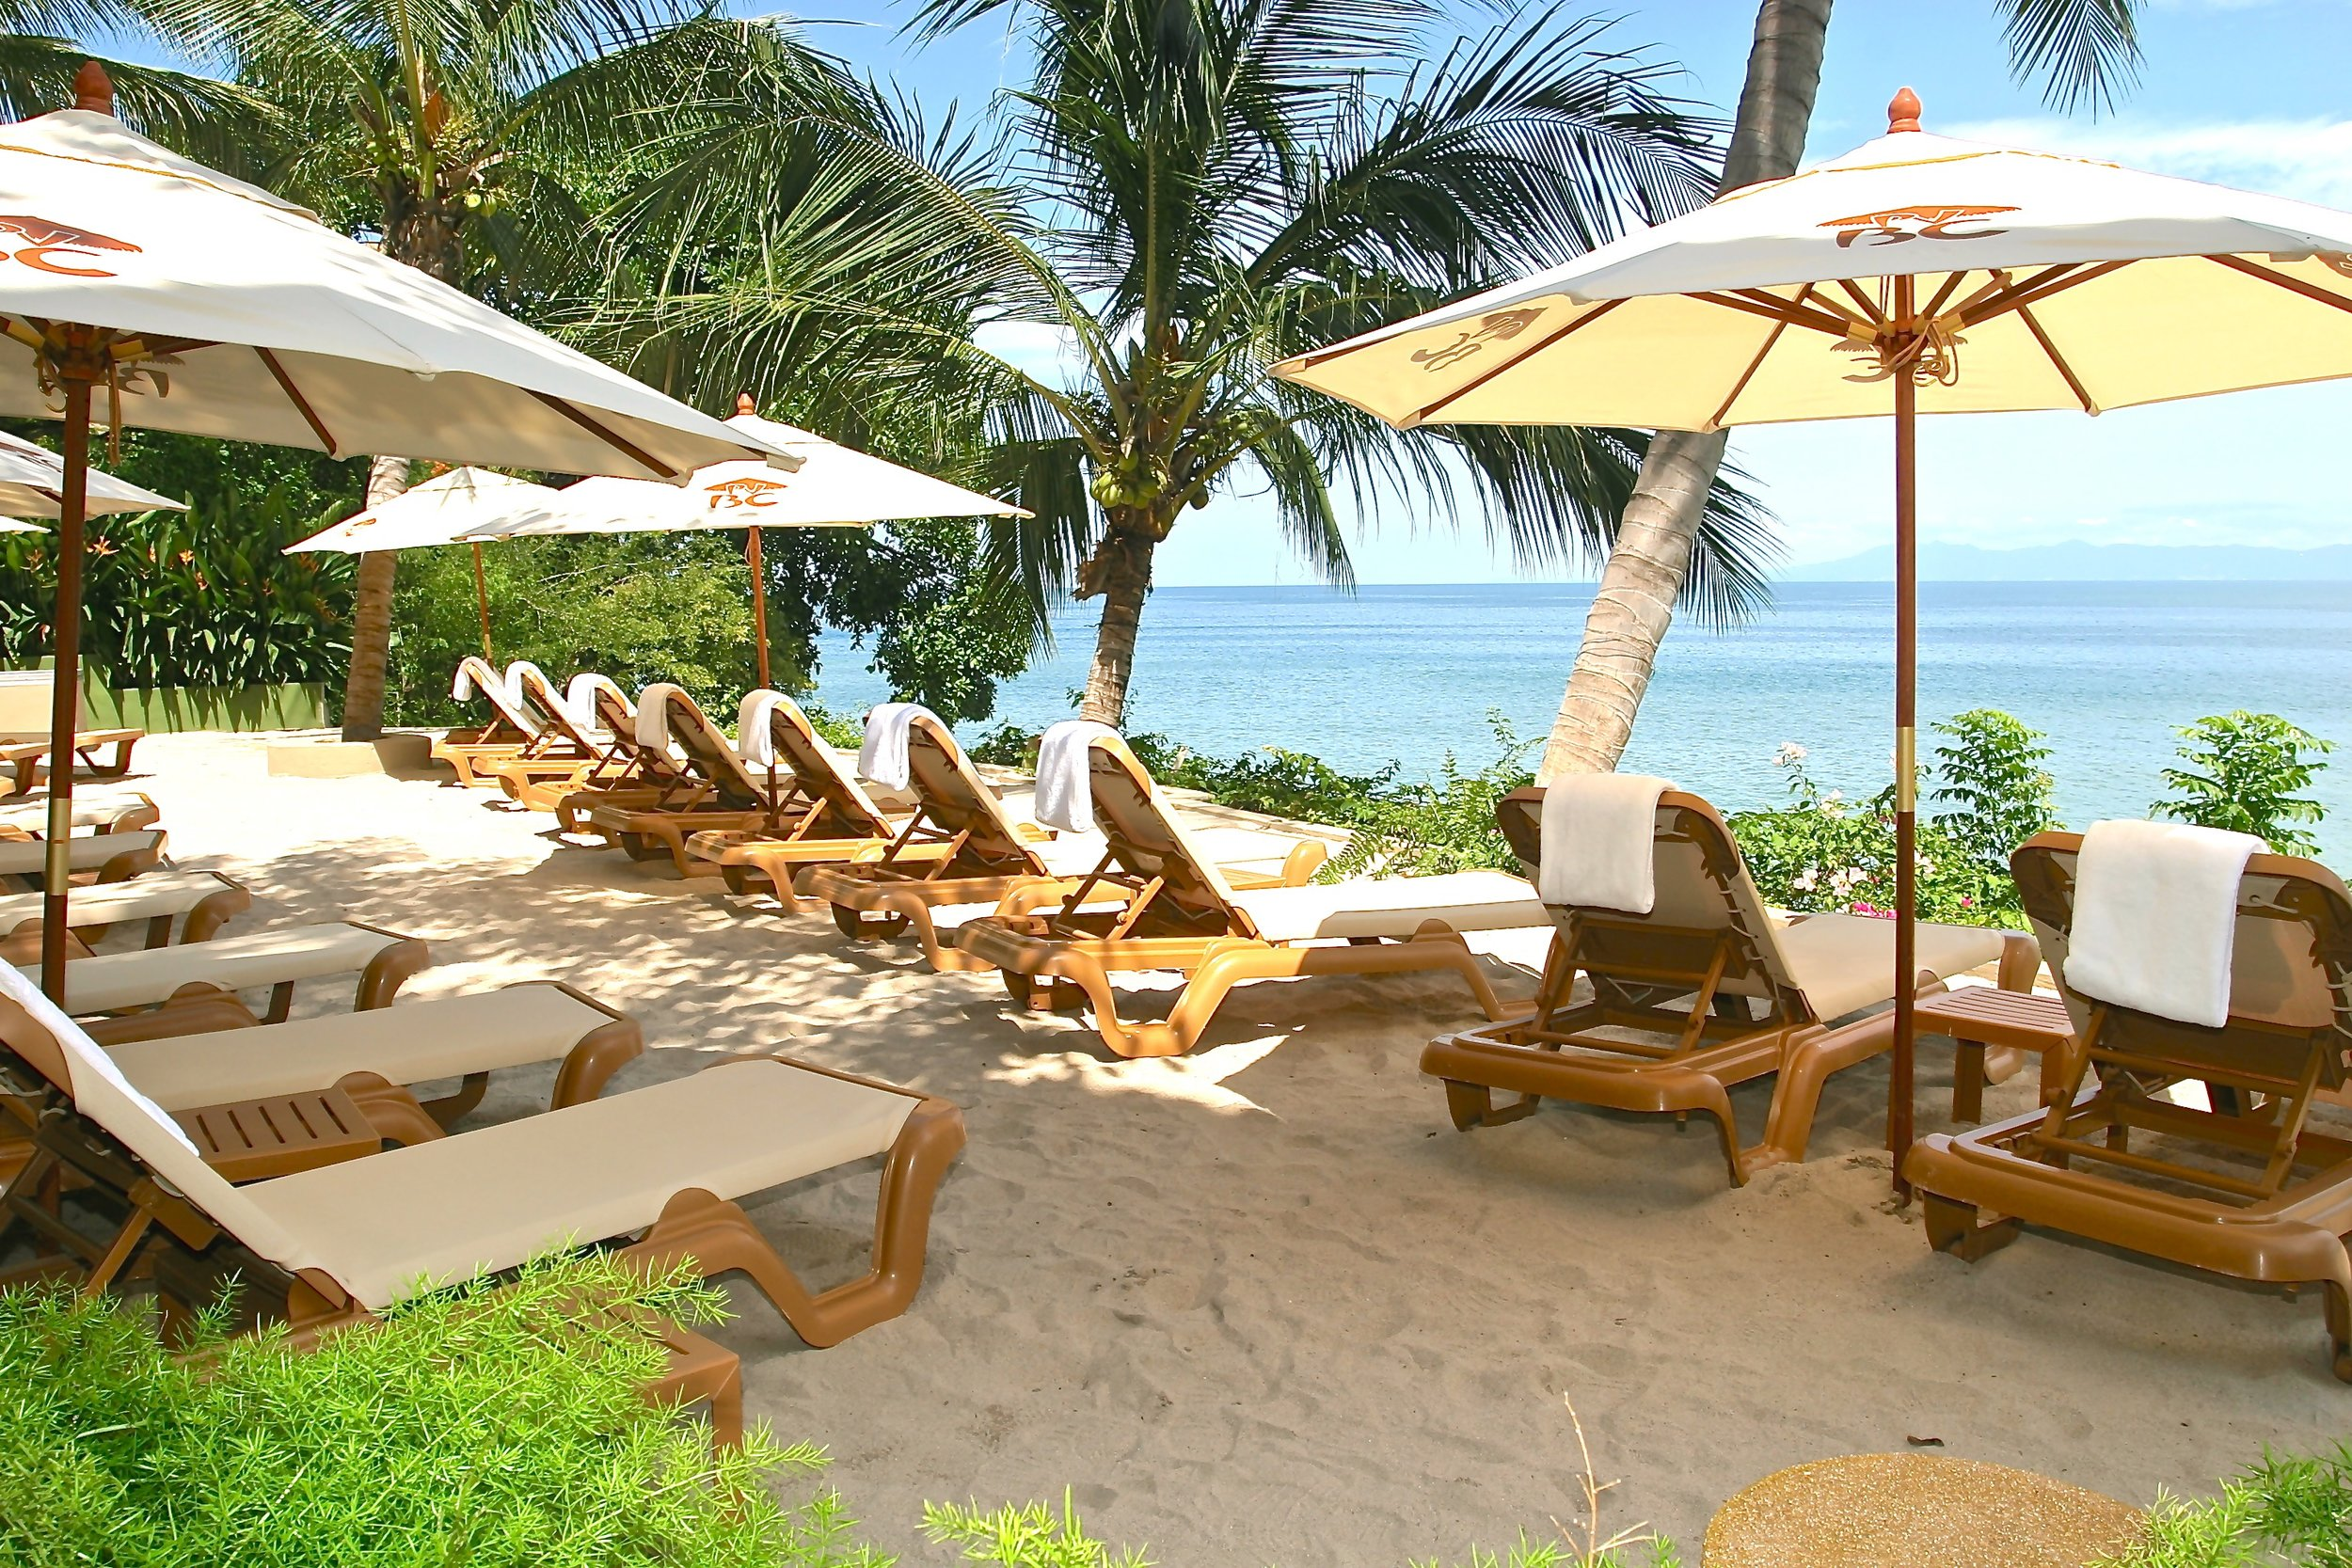 Vacation Vallarta Beachouse Private Beach